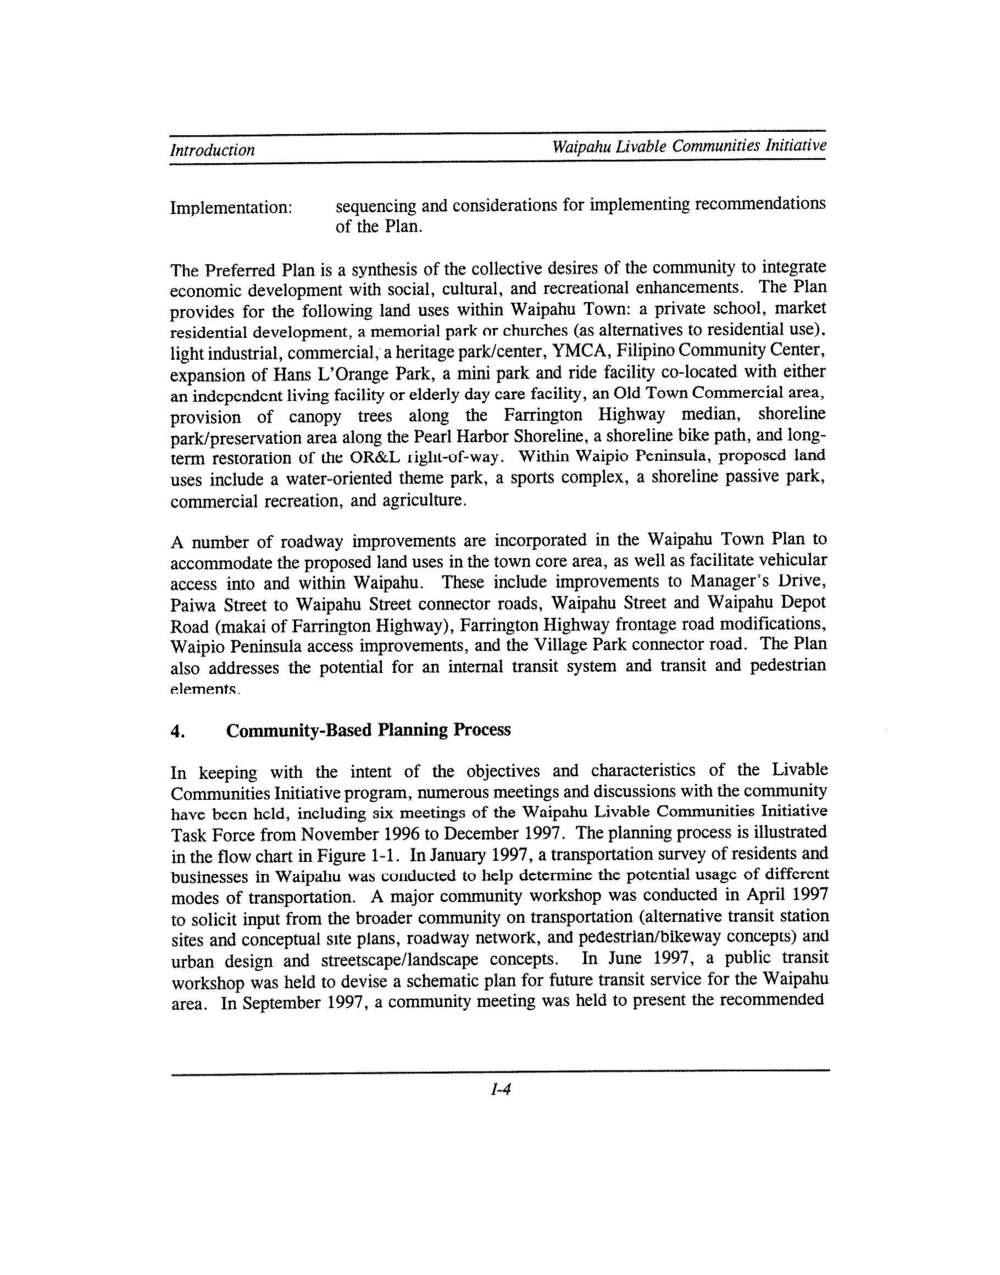 160531_WaipahuLivableCommunities(1998)_Page_012.jpg